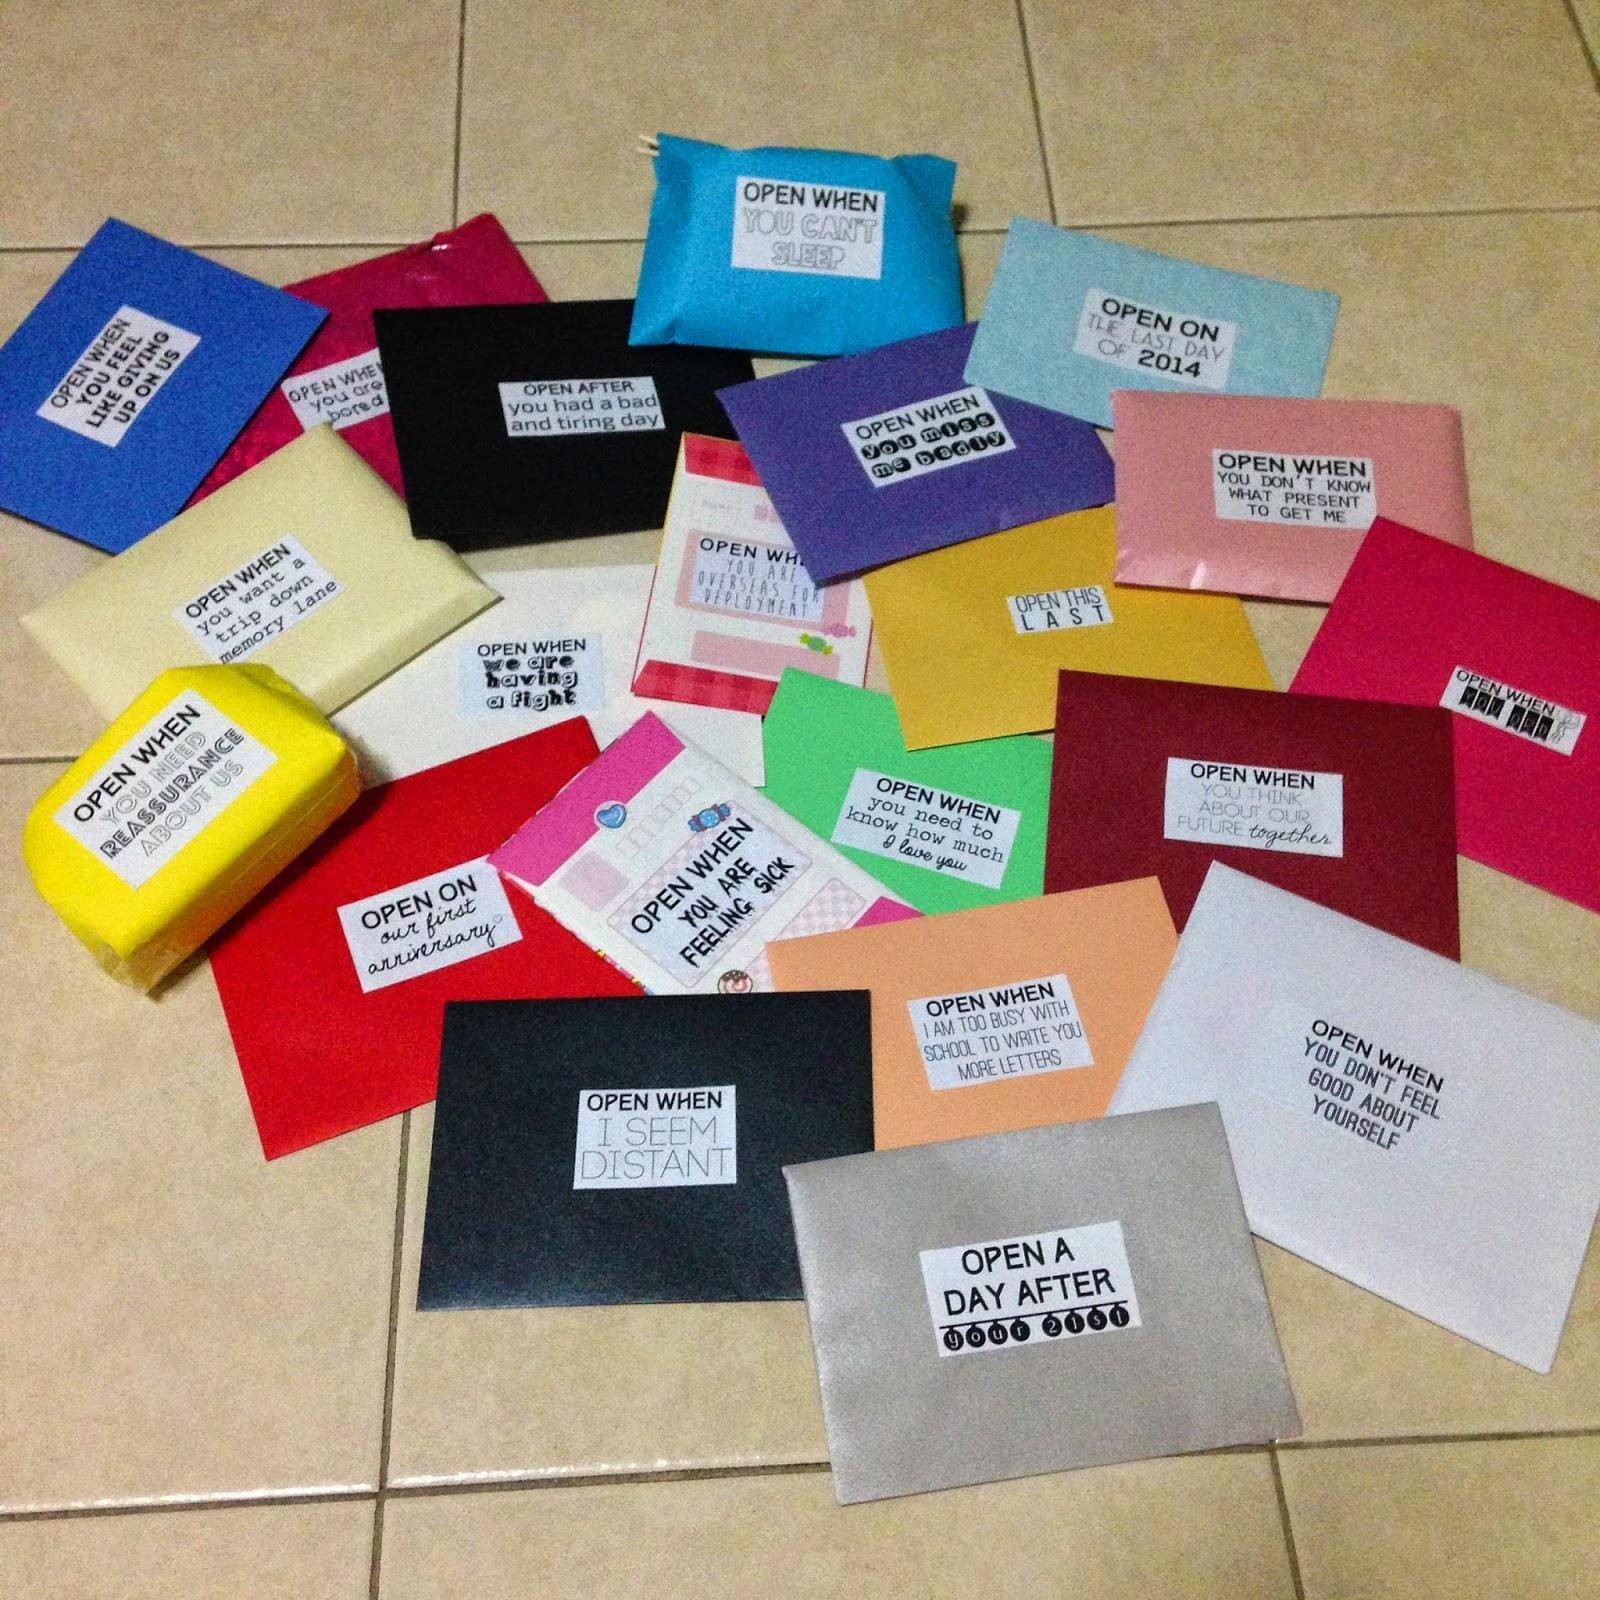 10 Nice Gift Ideas For 16Th Birthday birthday gift ideas for him birthday party ideas for teens 3